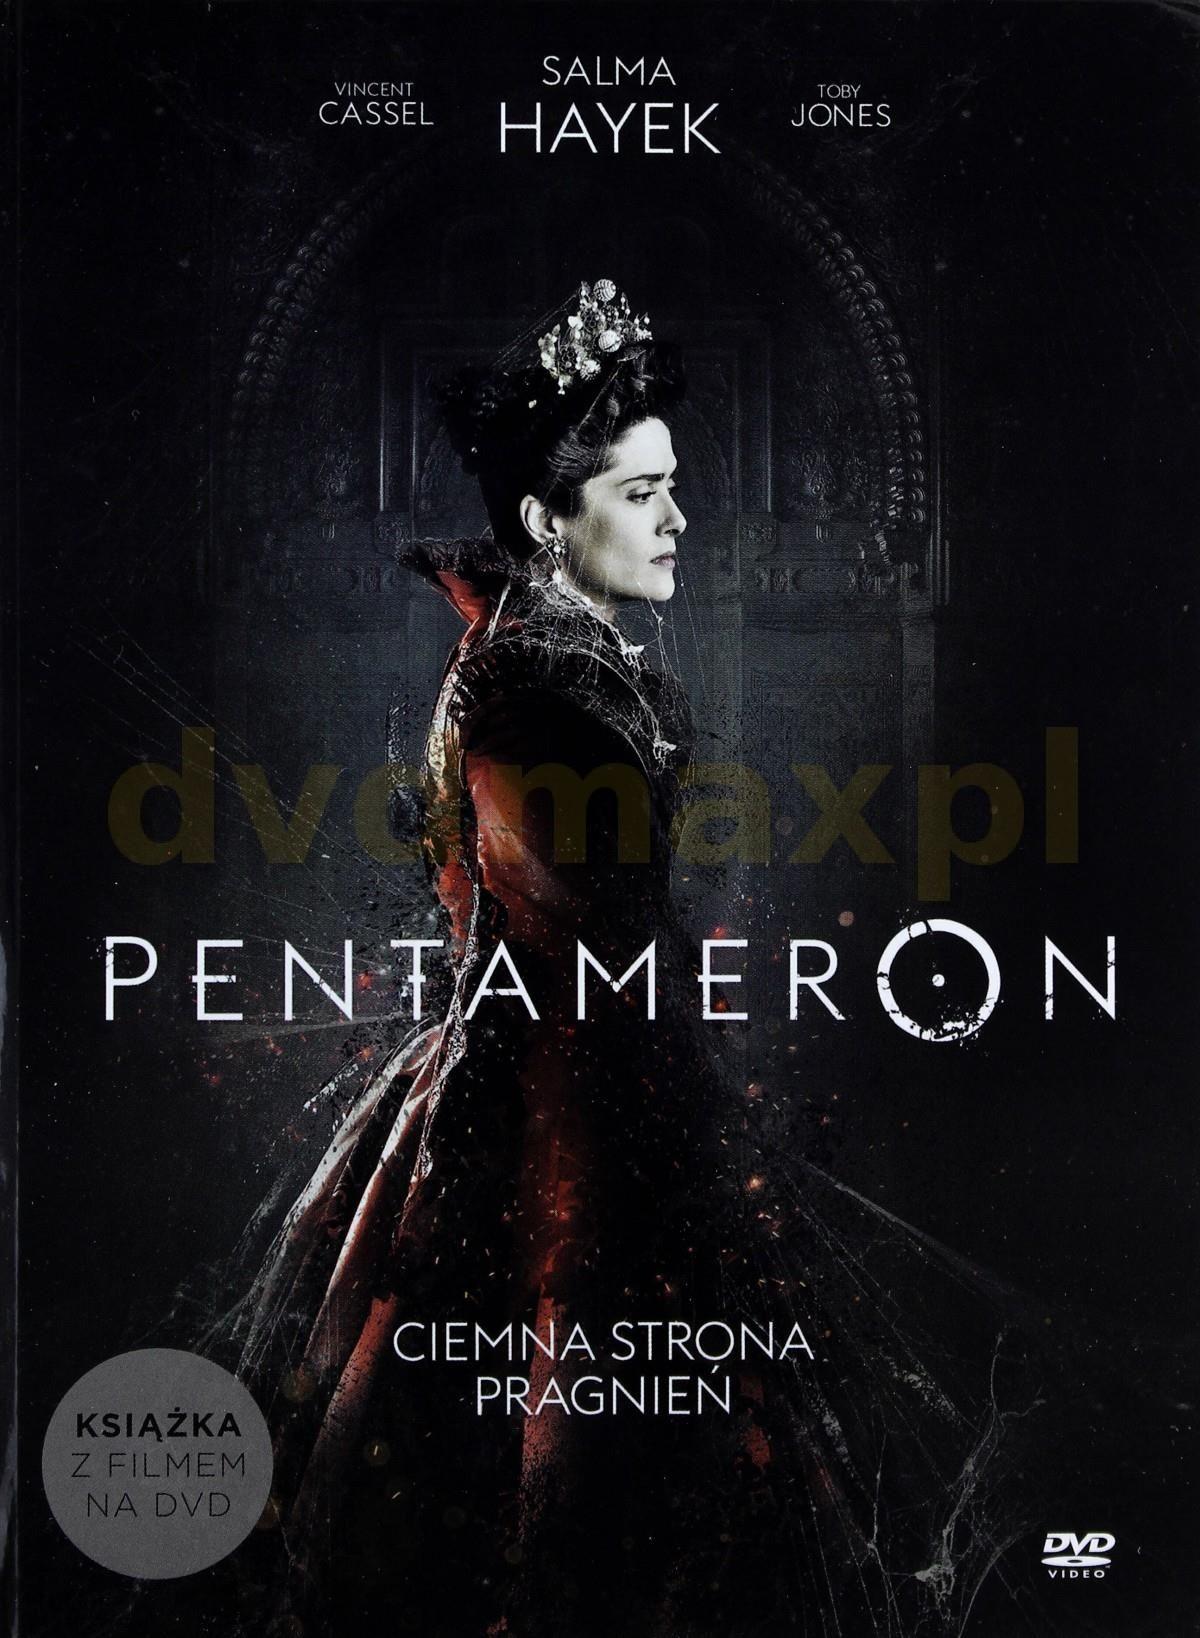 4f9c27064428fb Film DVD Pentameron (booklet) [DVD] - Ceny i opinie - Ceneo.pl